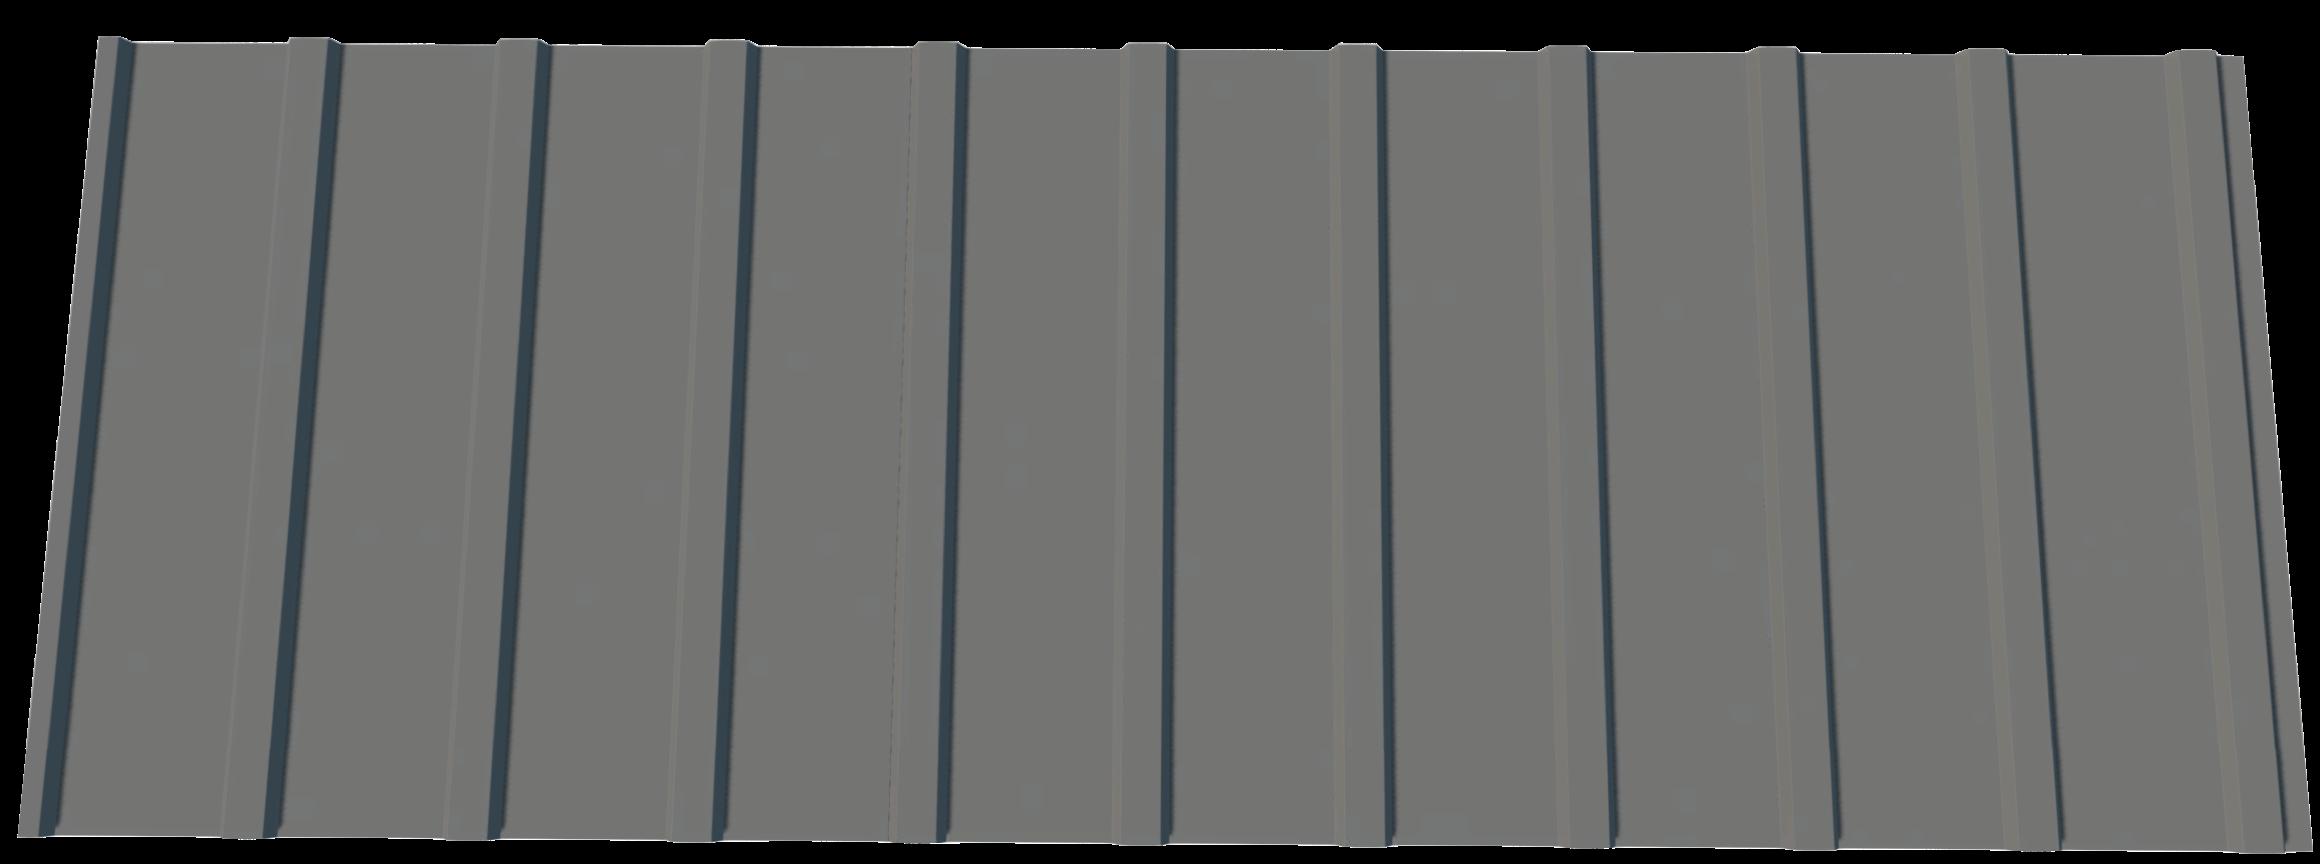 damwandplaten t12 dak